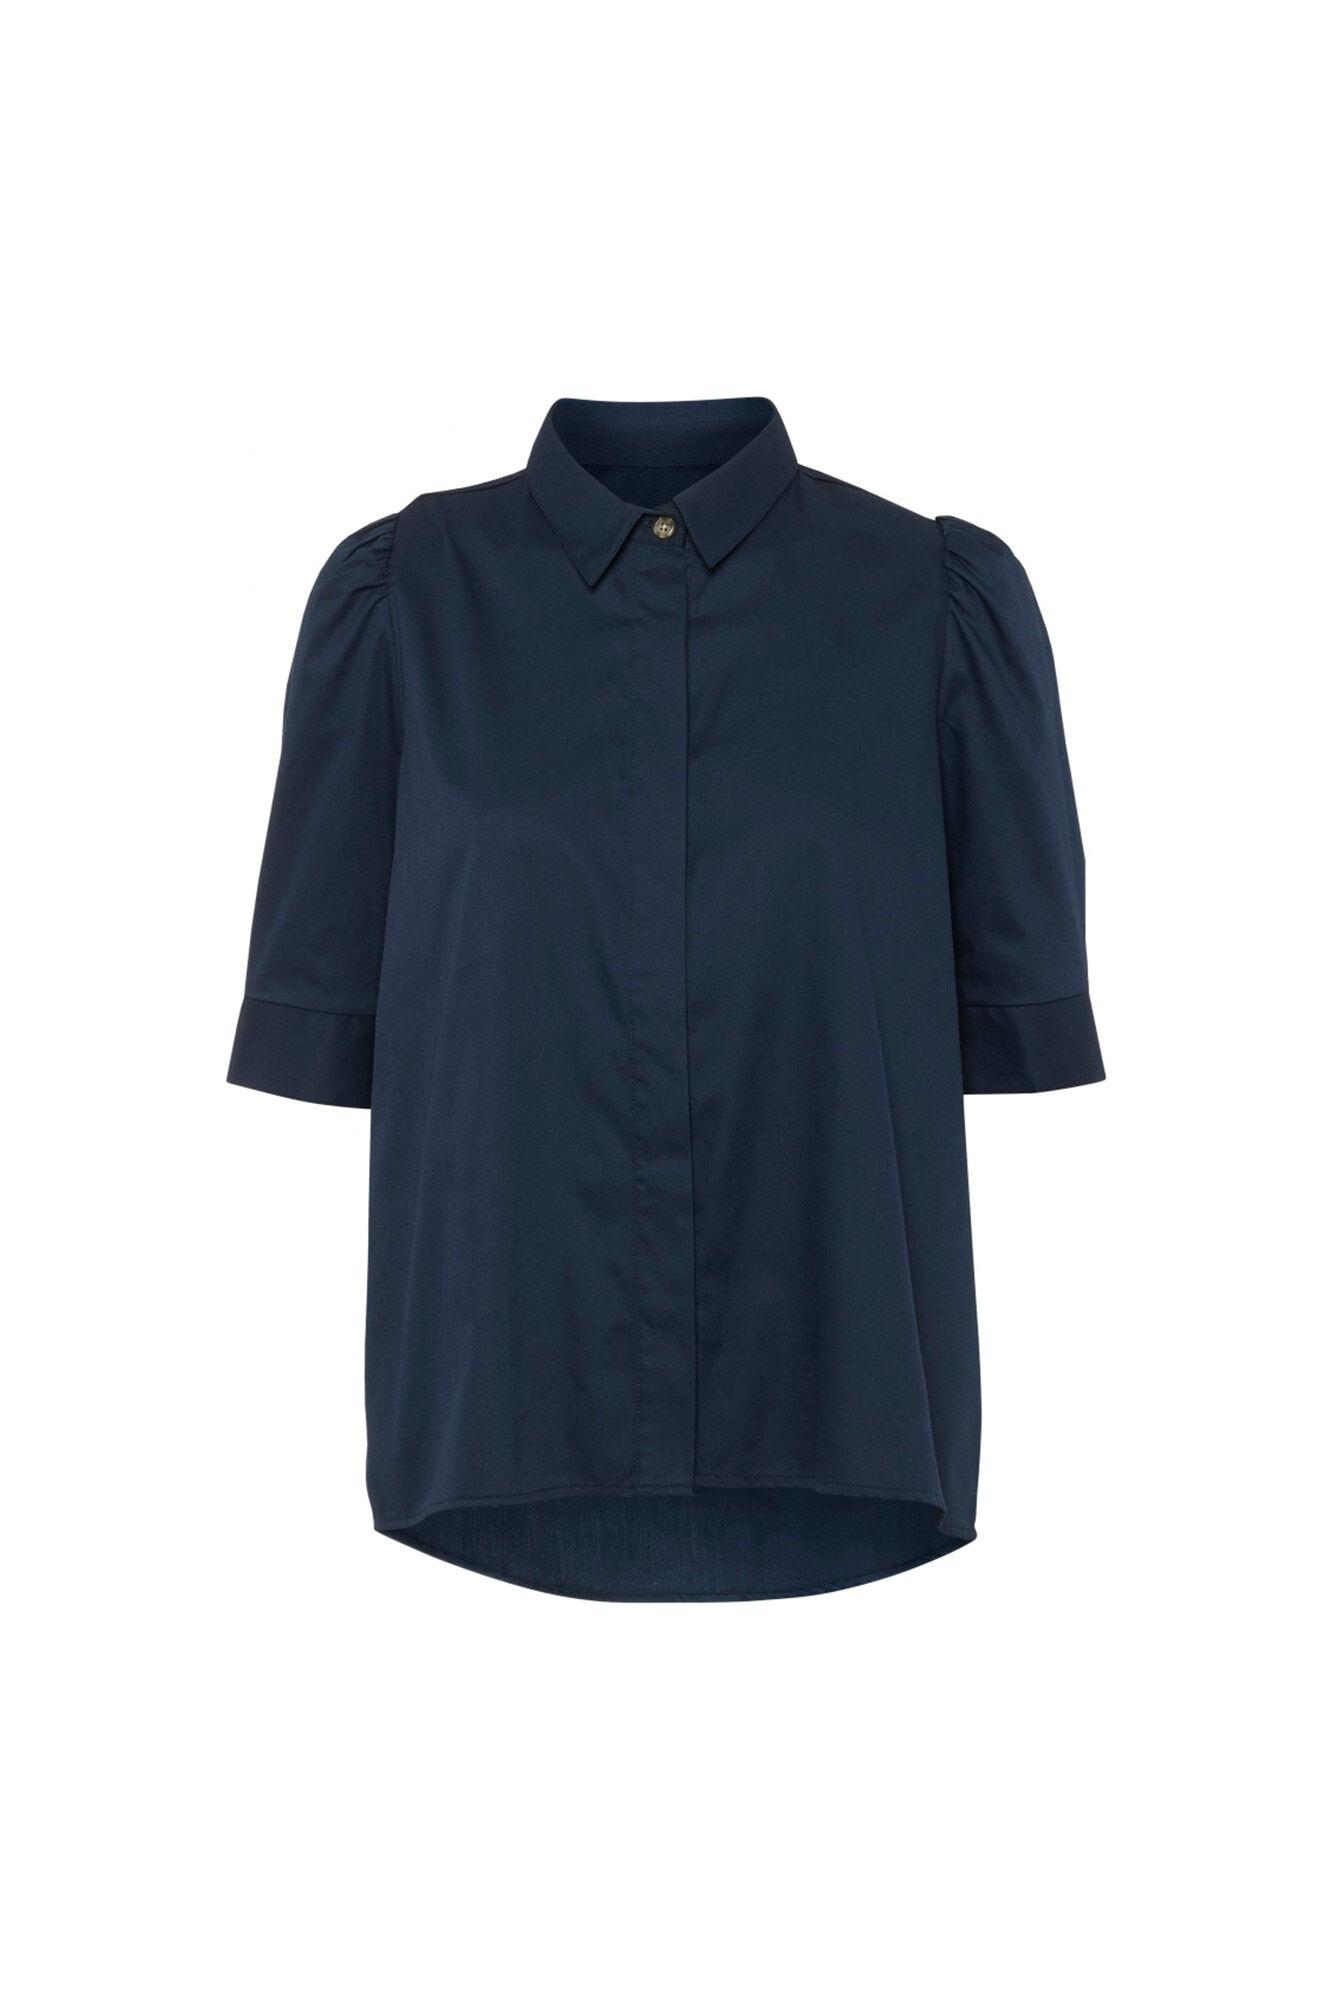 Billie shirt, NAVY